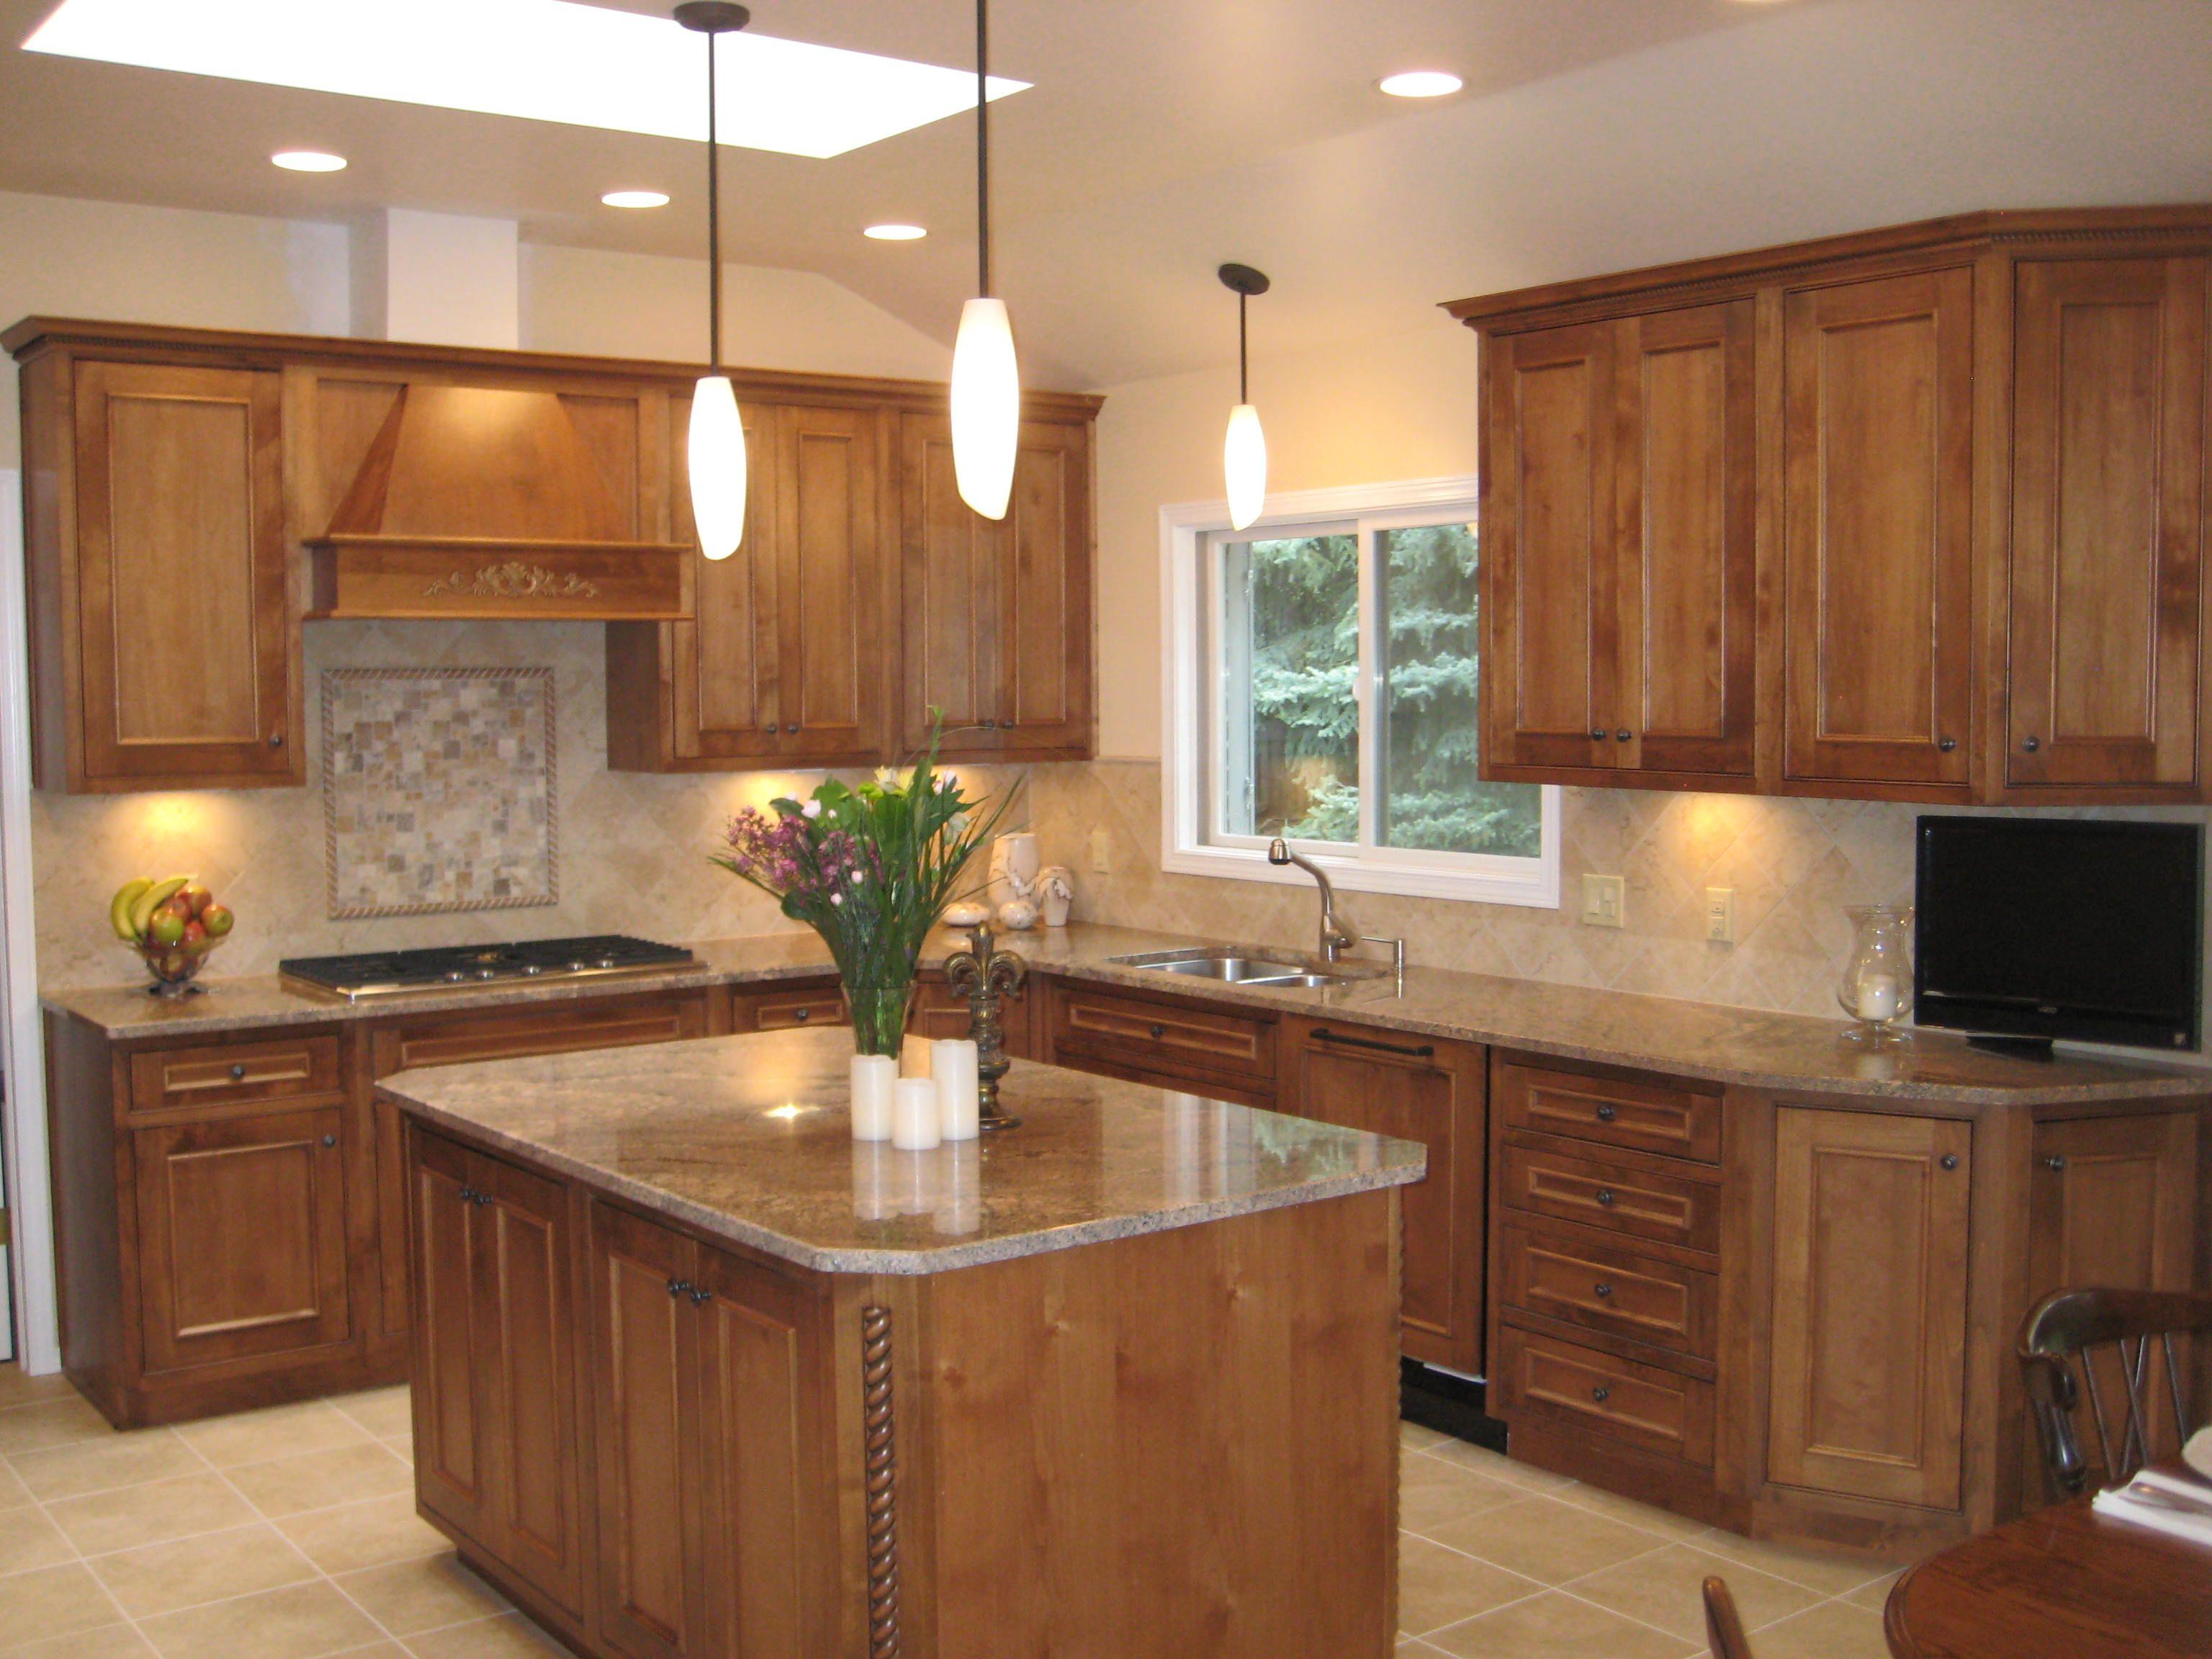 Wooden L Shaped Kitchen Island With Sink Idea In Small Kitchen Decoration Ideas Small L Shaped Kitchens Custom